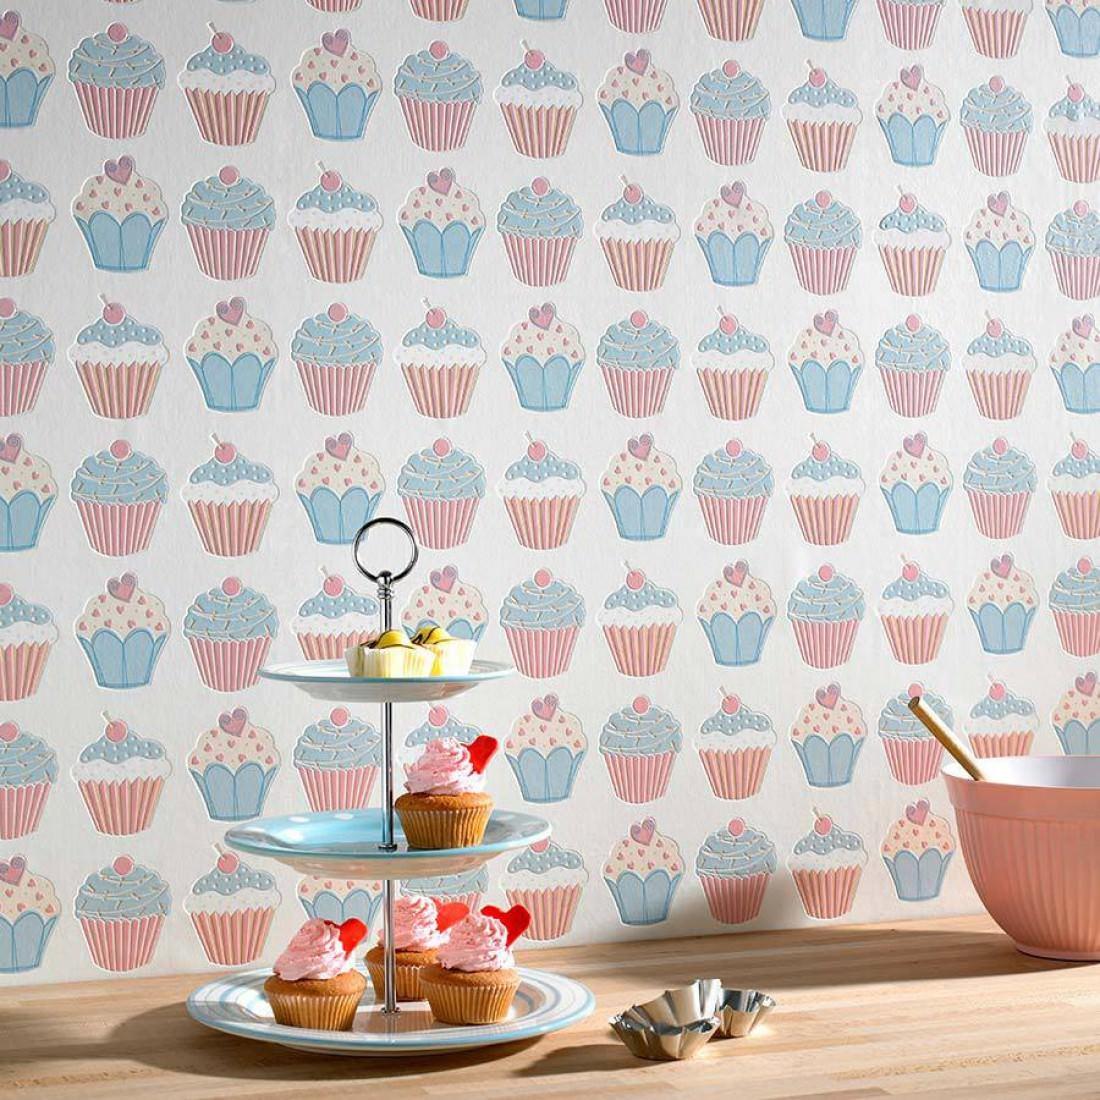 Carta da parati cupcake bianco crema blu chiaro rosa for Carta da parati degli anni 70